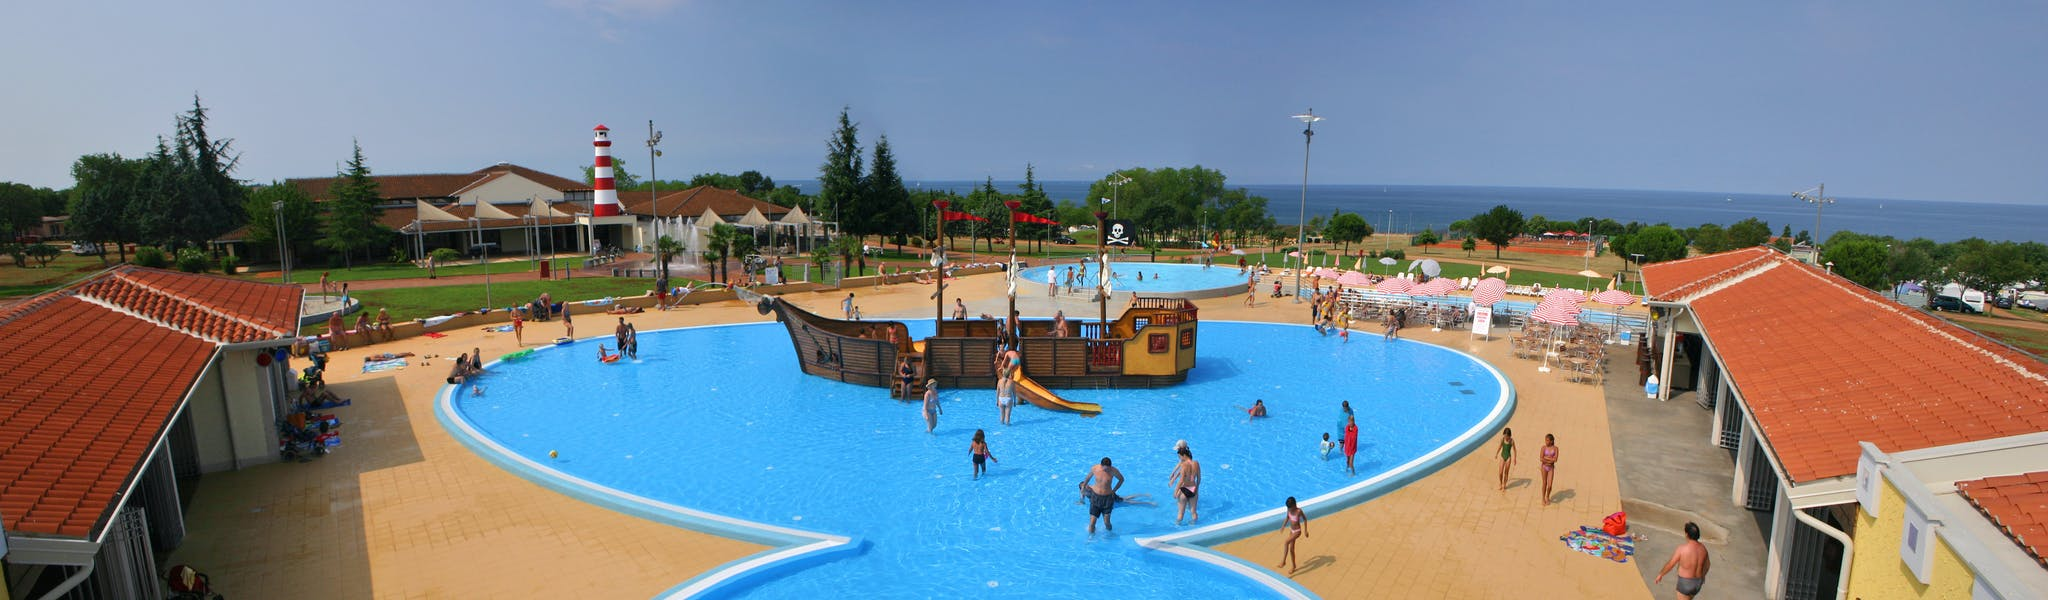 zwembad piratenschip camping Park Umag